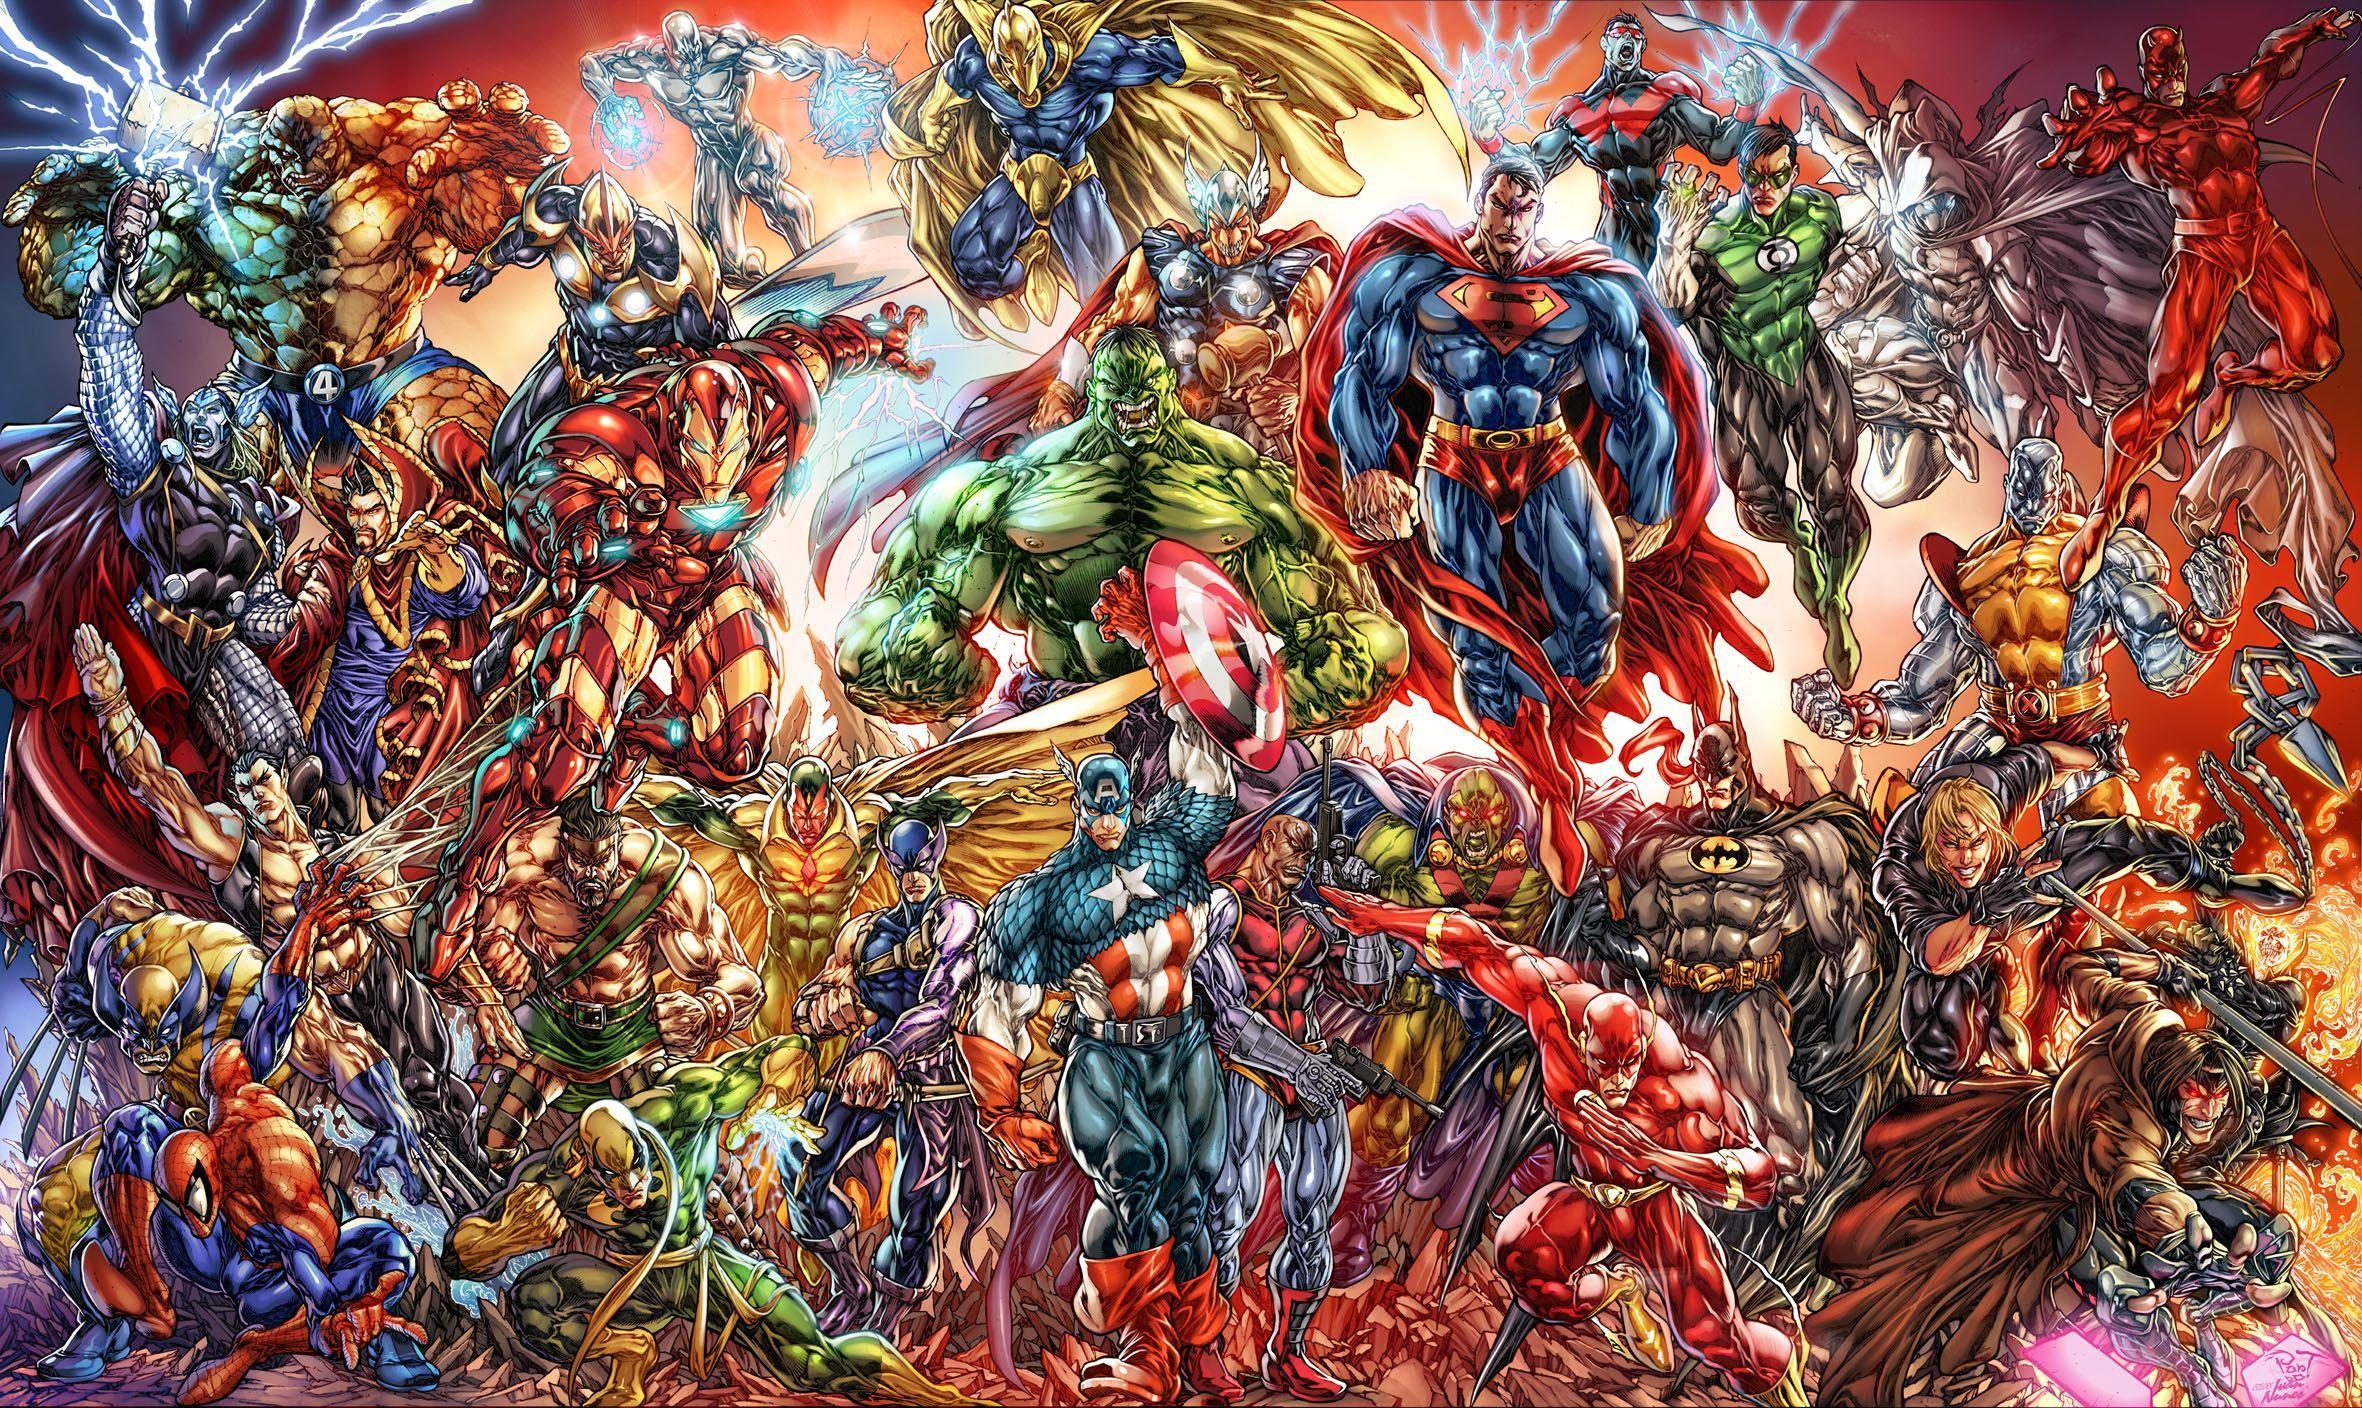 Comic Strip Wallpapers Hd Wallpaper Cave